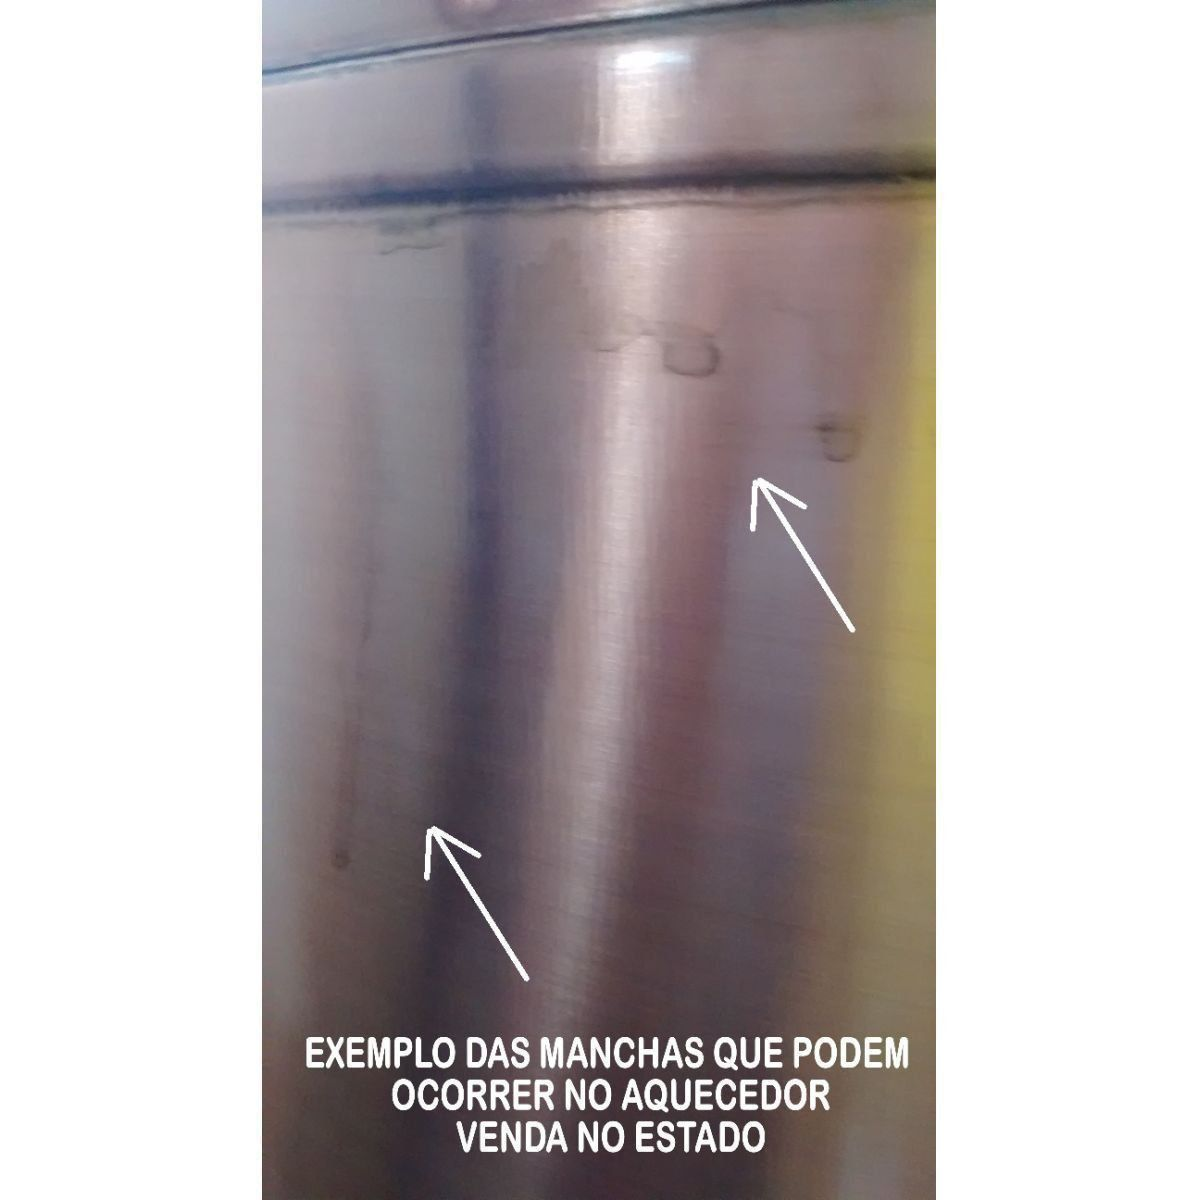 Aquecedor de ambiente Externo a Gás YR-103 BRONZE 1696 VENDA PROMOCIONAL NO ESTADO